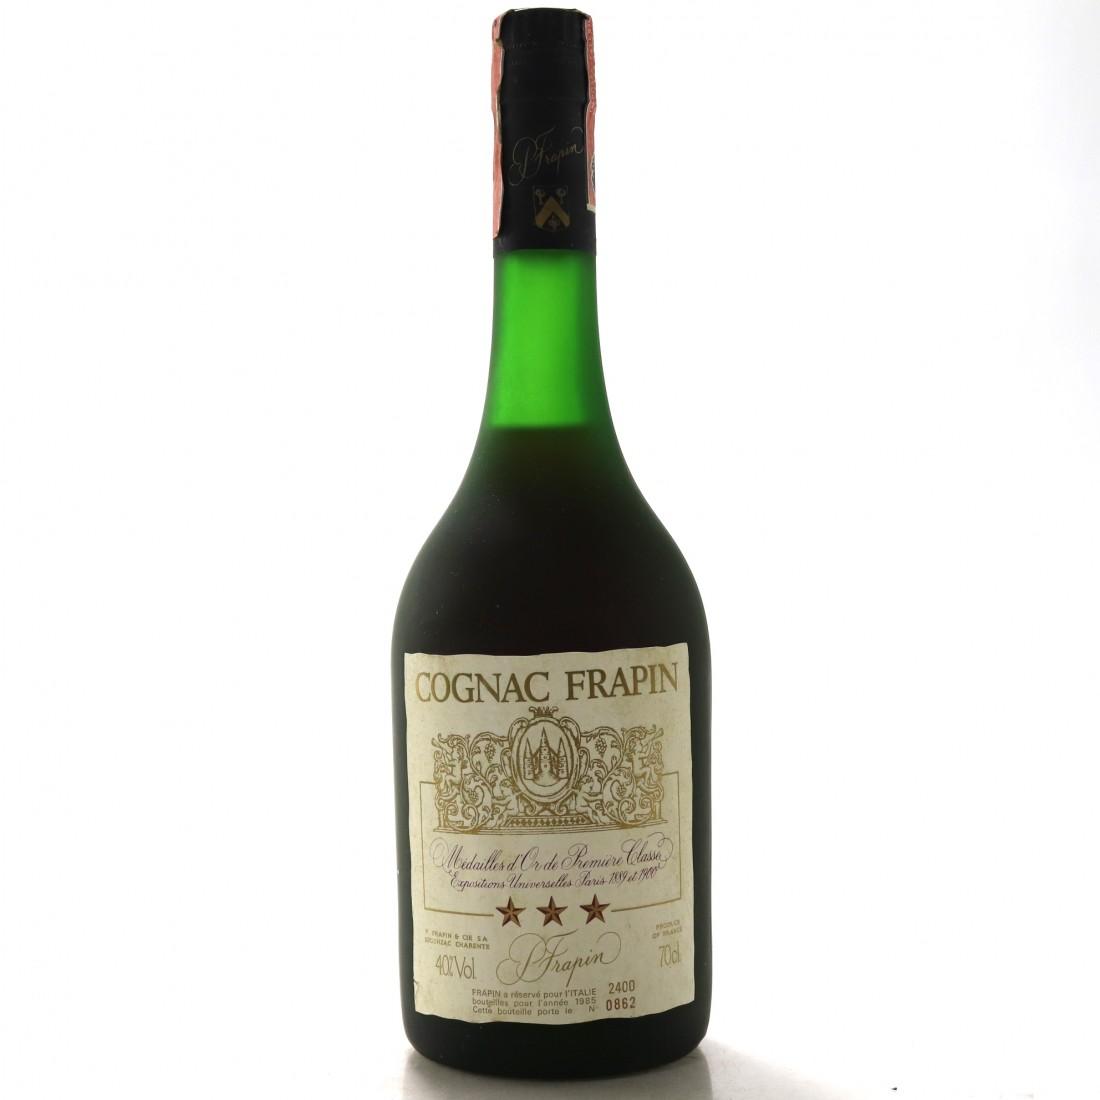 Frapin 3 Star Cognac 1985